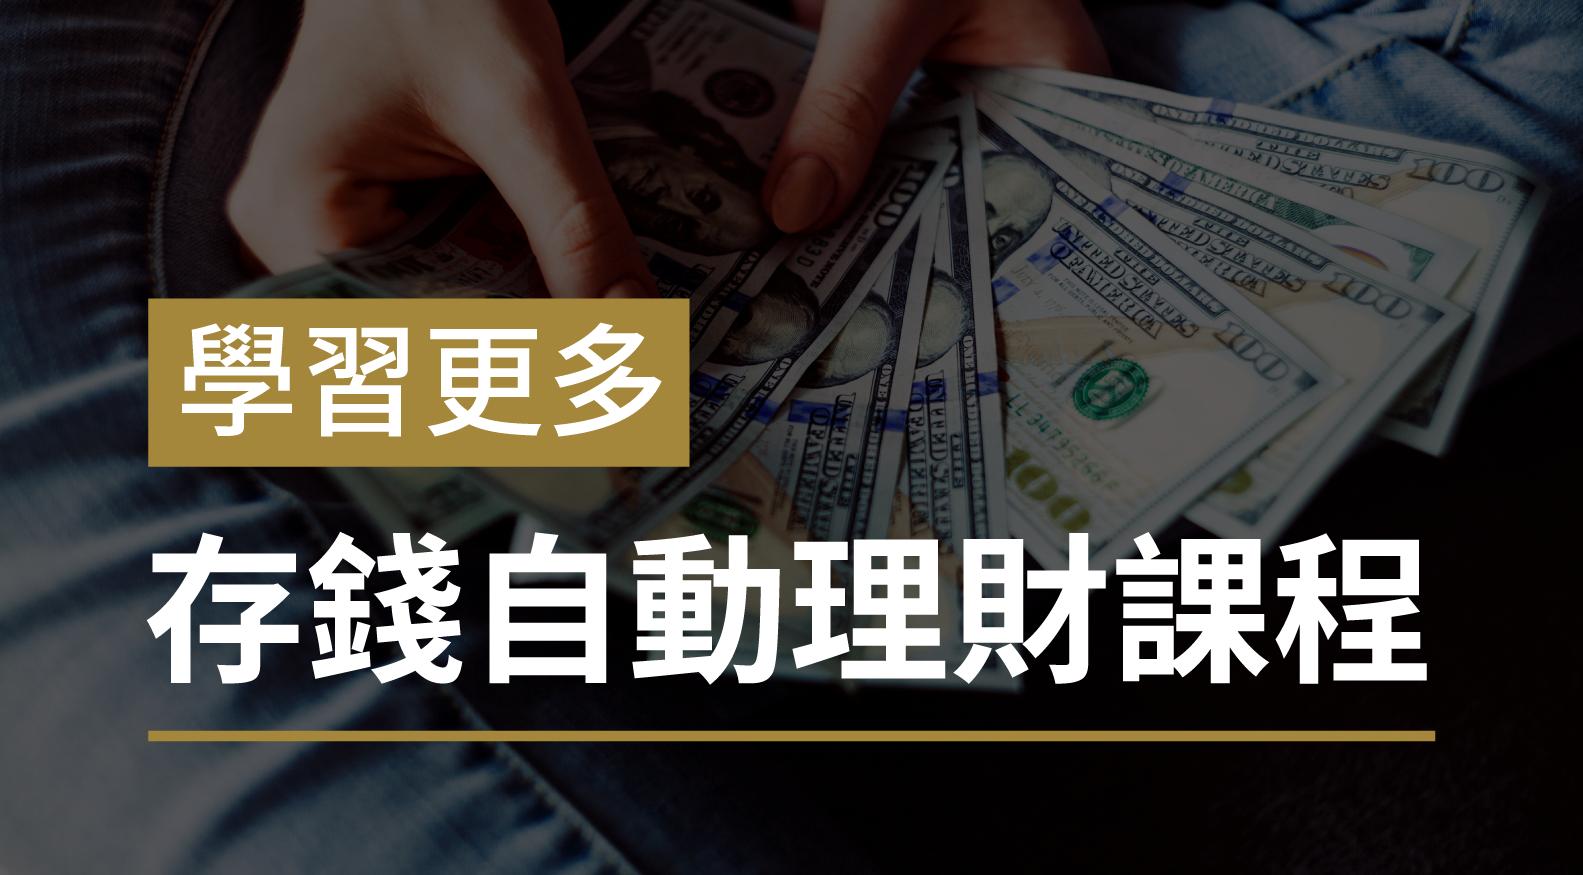 4.【BOS 學習更多1】存錢自動理財課程 (4h51m35s)